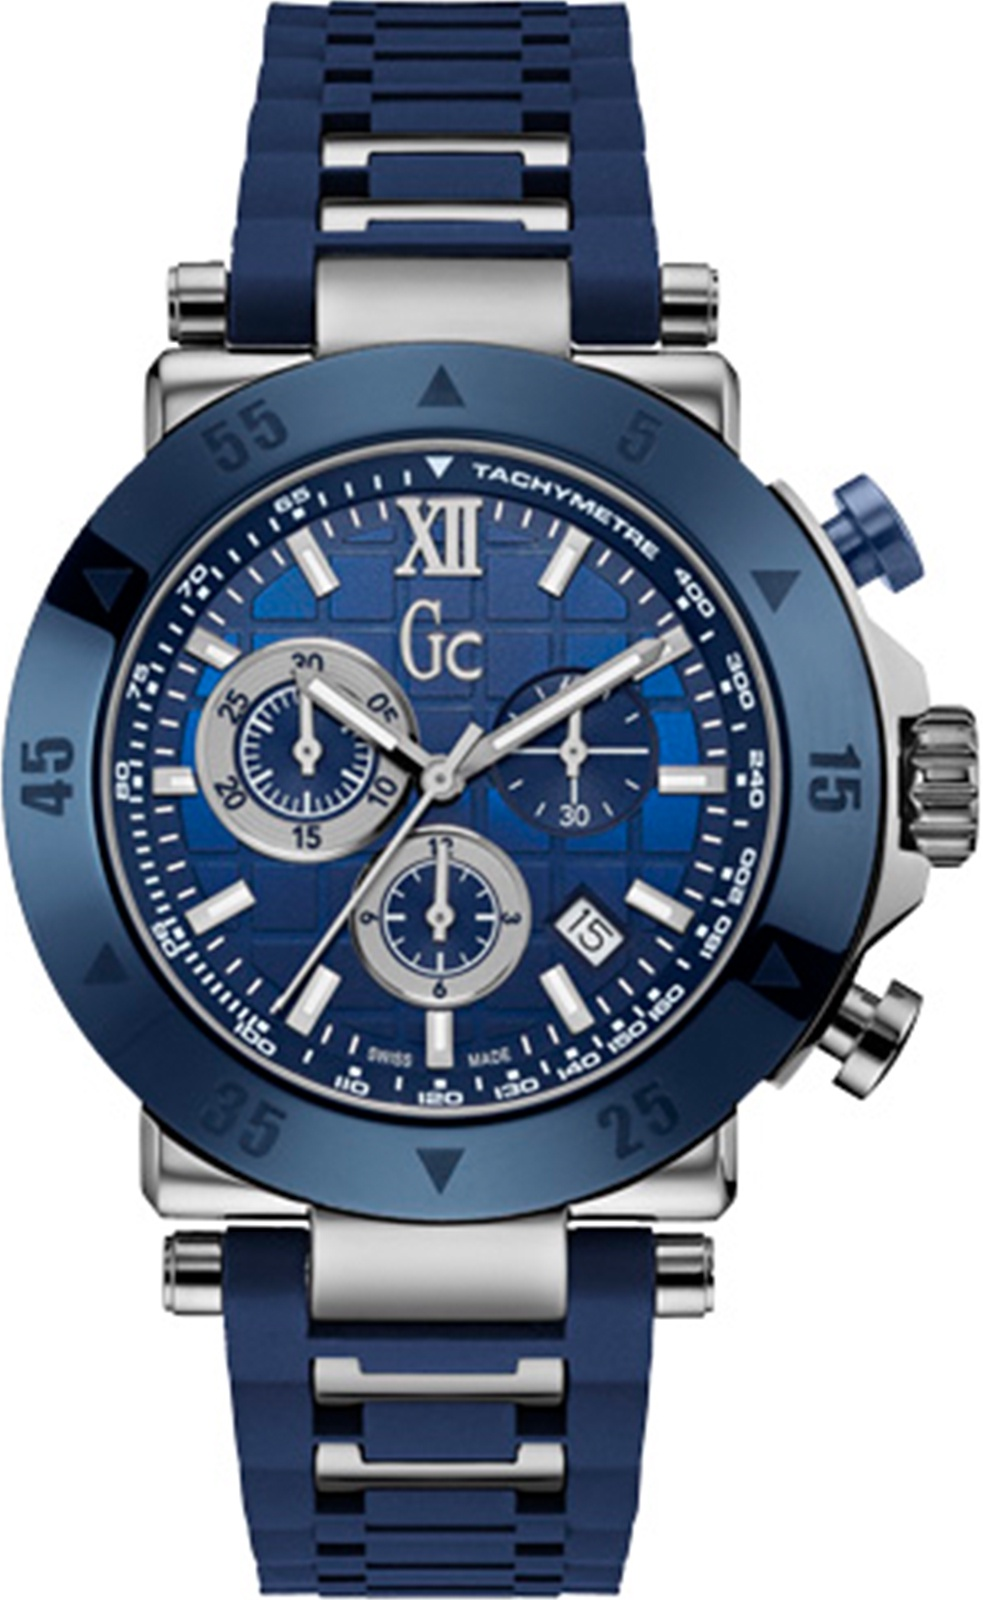 Часы GC Gc-1 Sport, синий, темно-синий, серебристый eric clapton eric clapton give me strength 3 lp